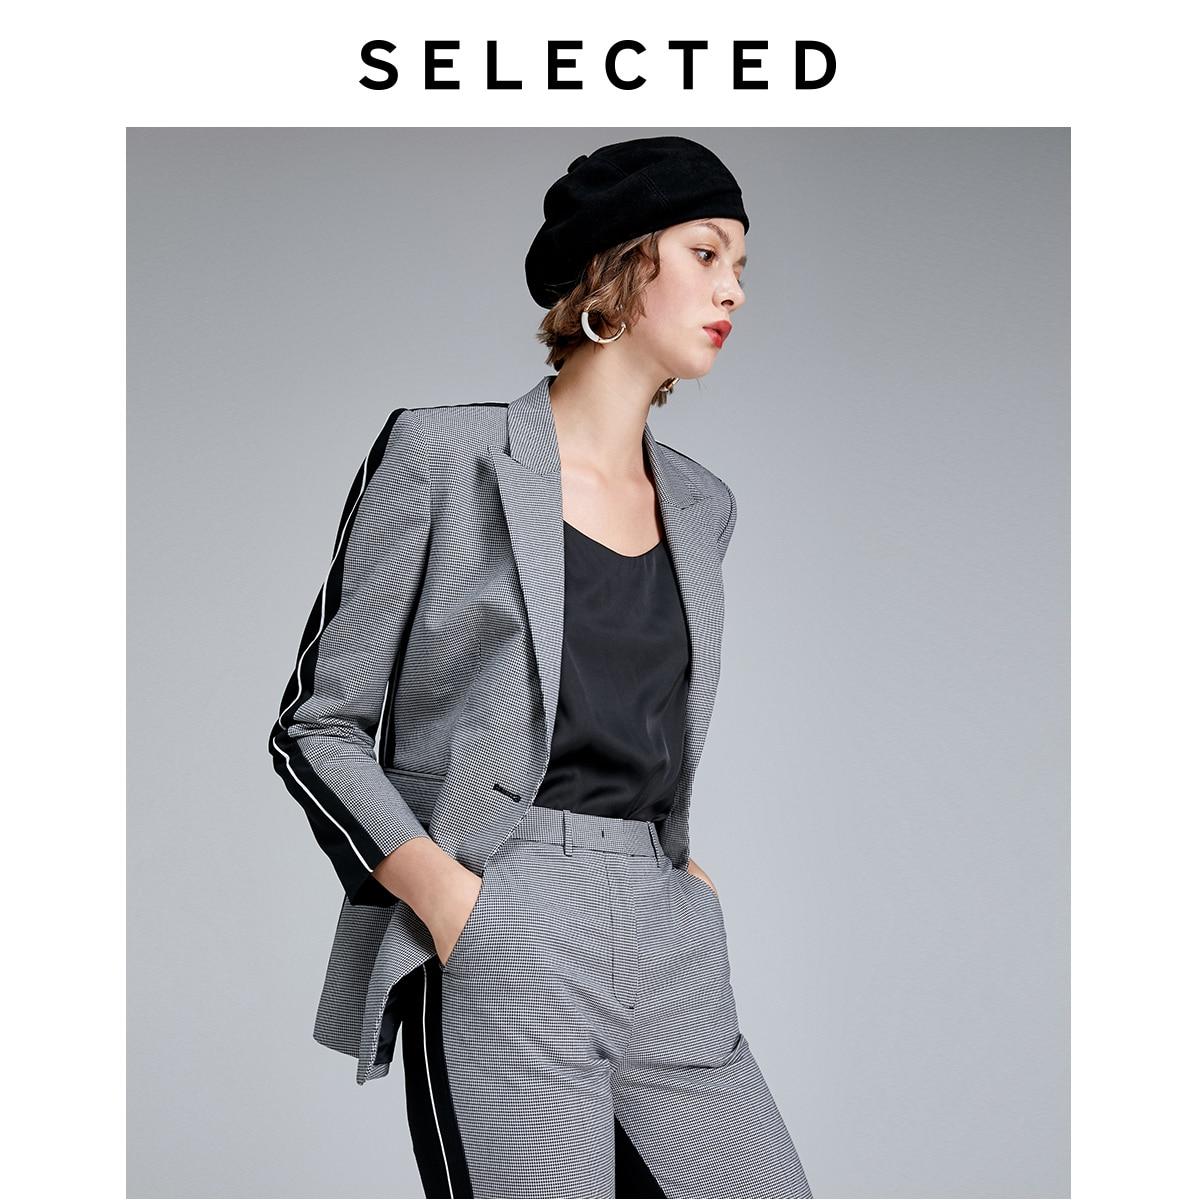 SELECTED Women's Cotton Retro Black & White Plaid Splice Blazer S|419372505